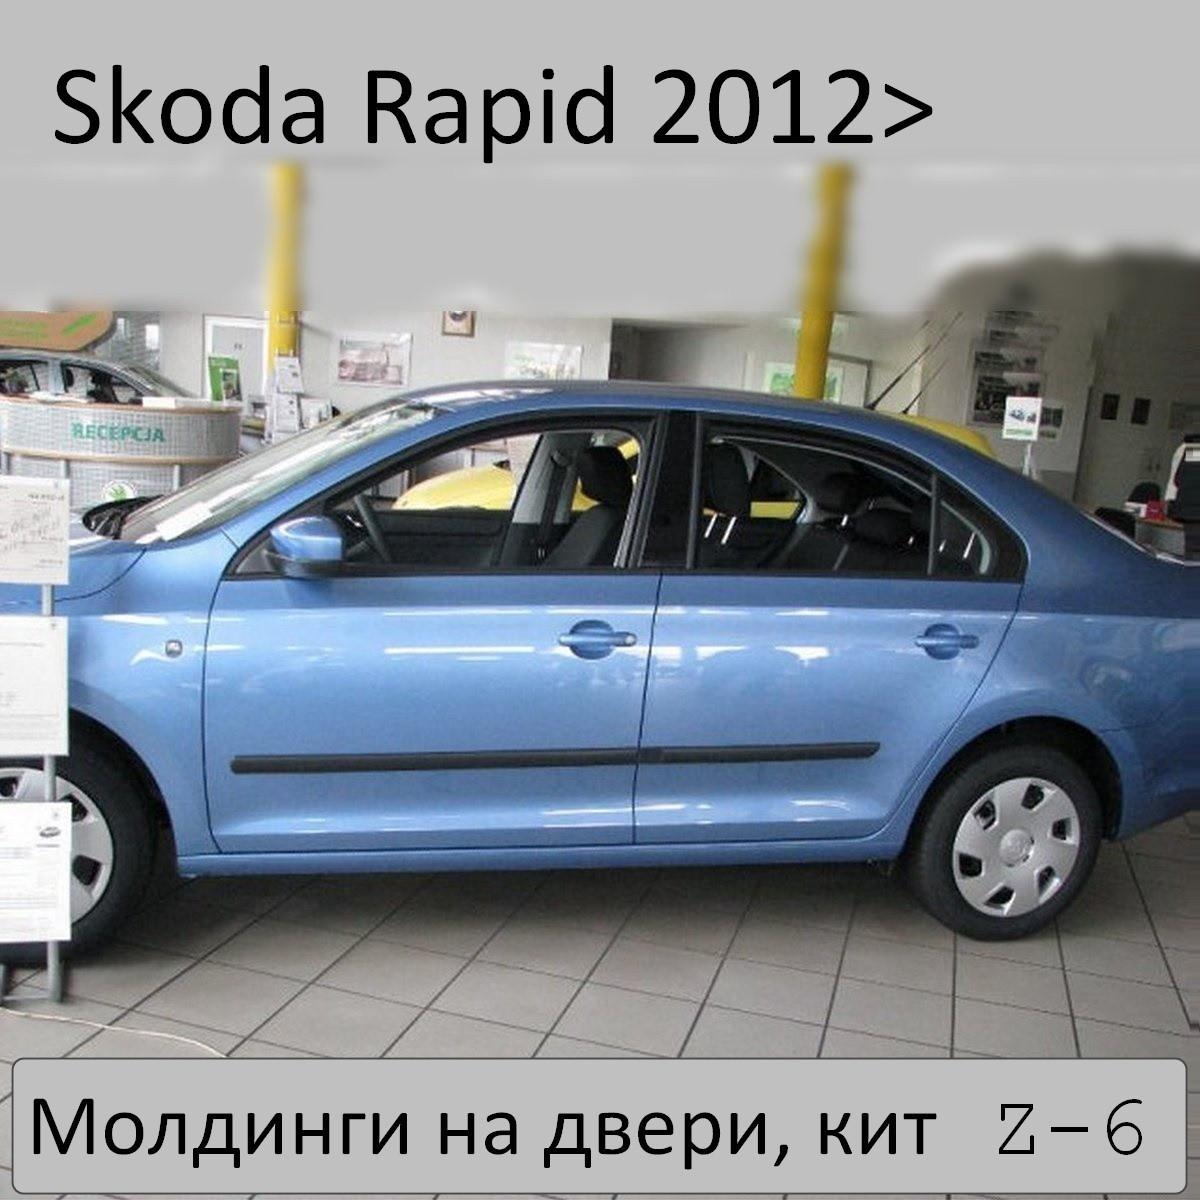 Молдинги на двери Skoda Rapid 2012>